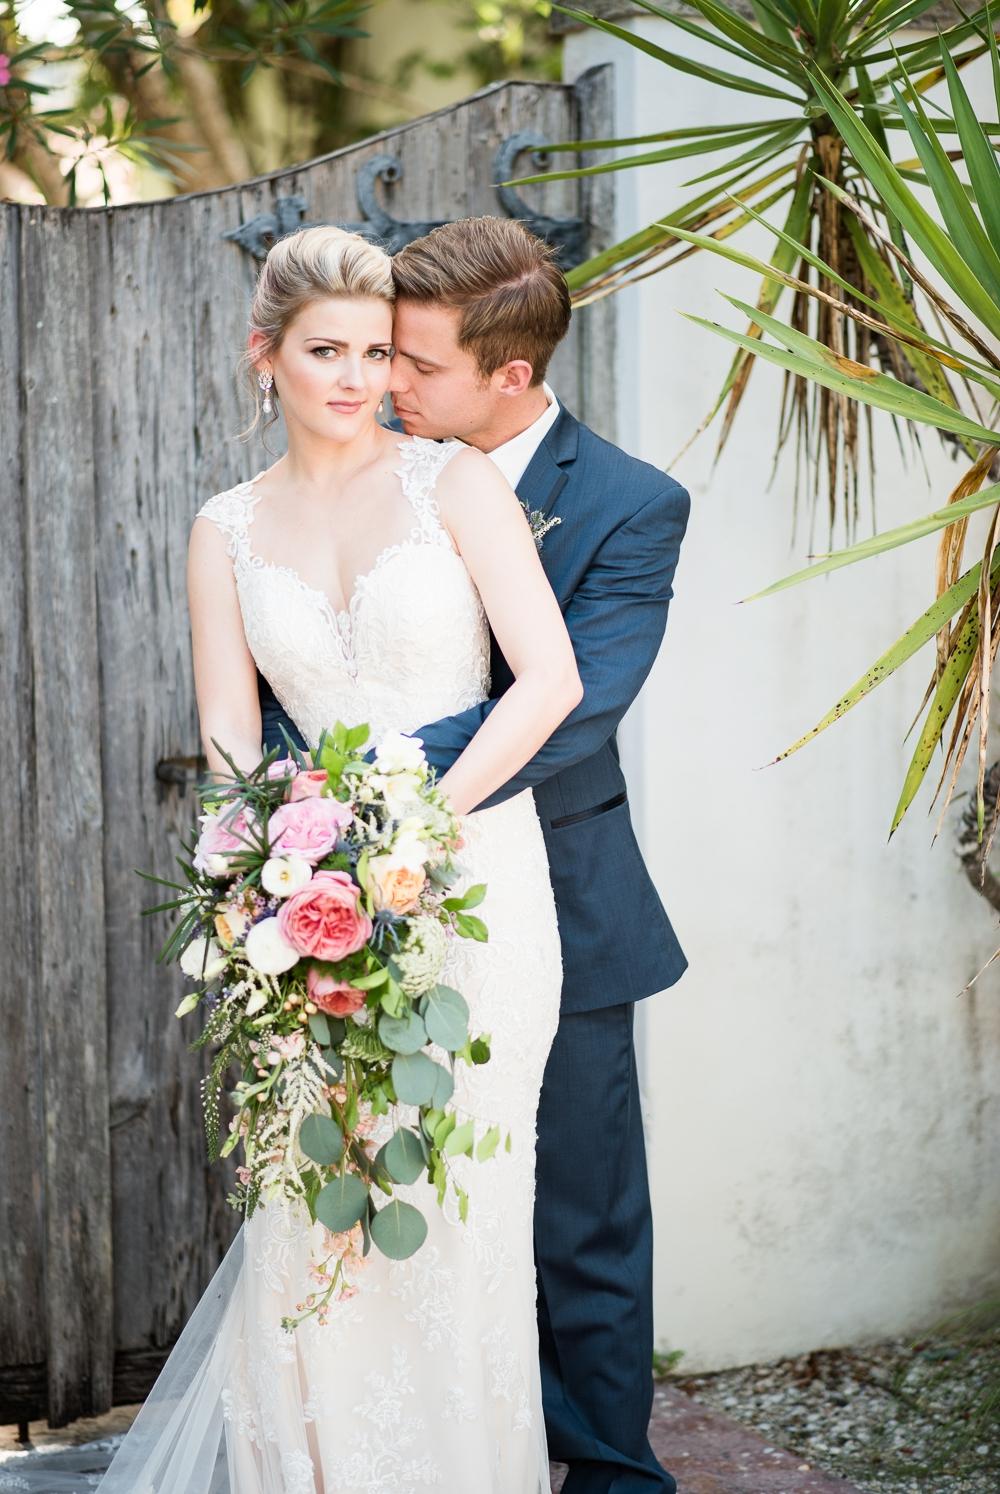 2016 HLM Wedding Beach Shoot 5.jpg